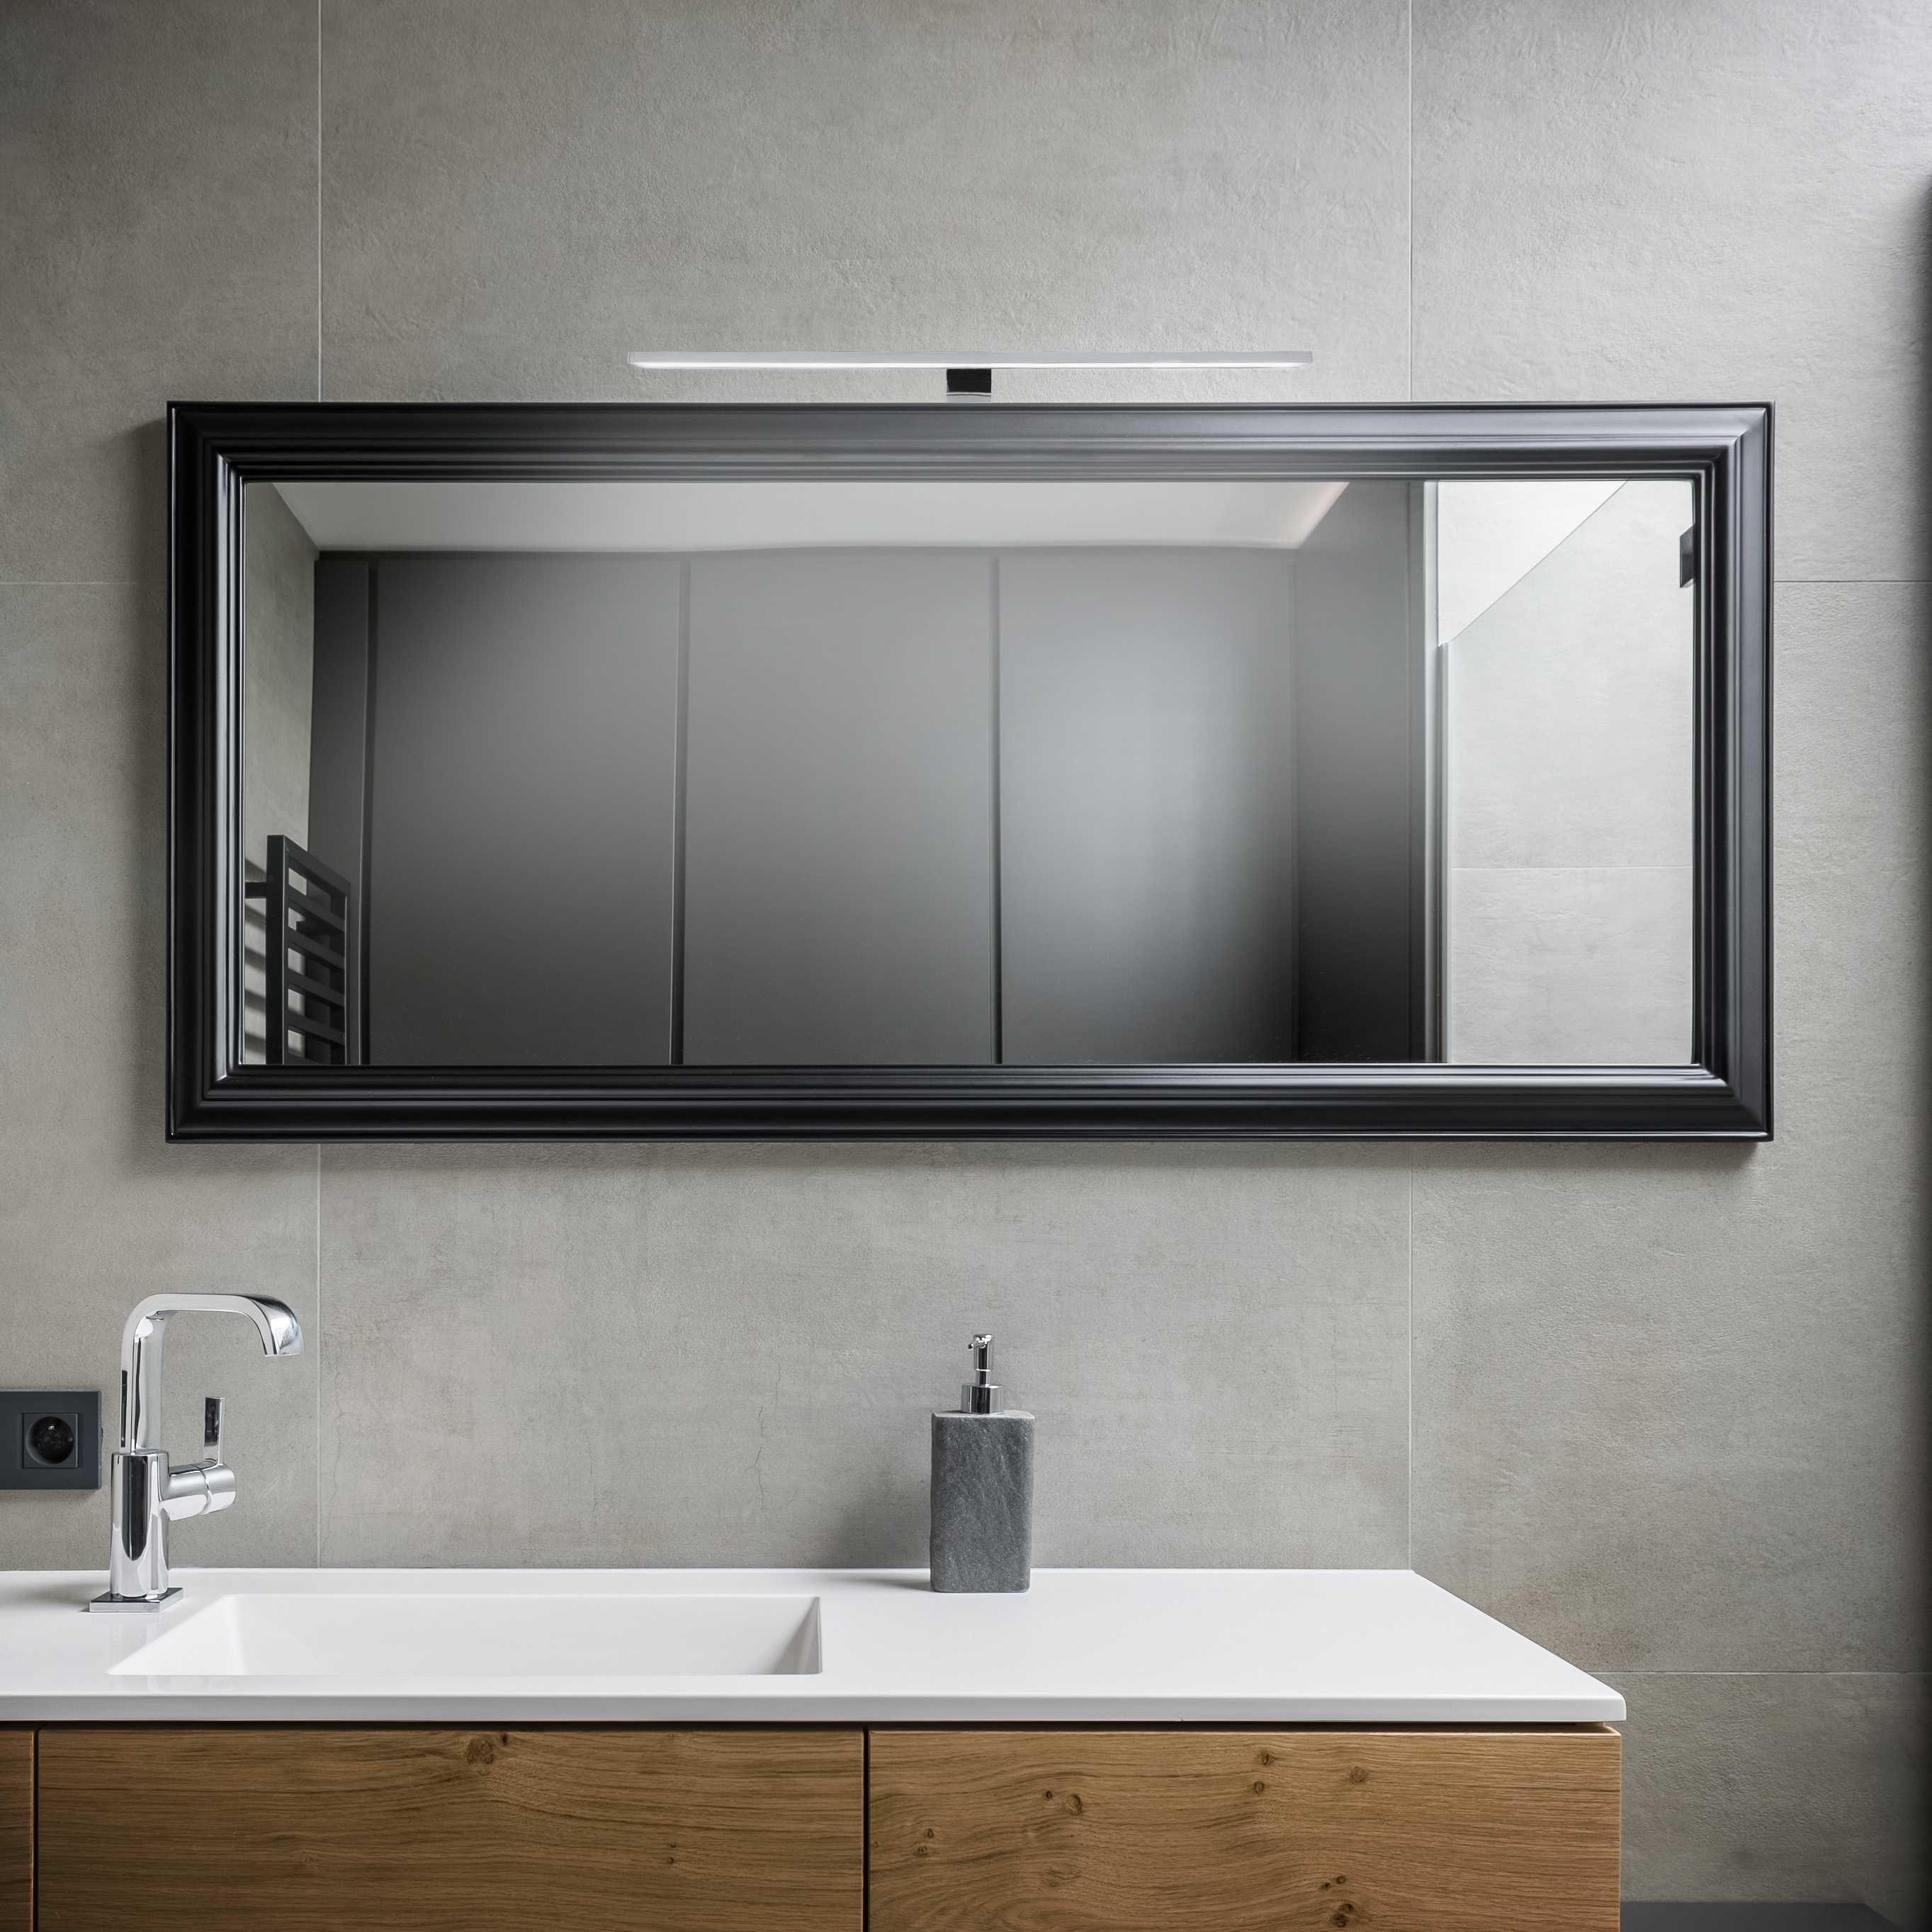 LED Spiegelleuchte, 60 cm, 8 W, Chrom